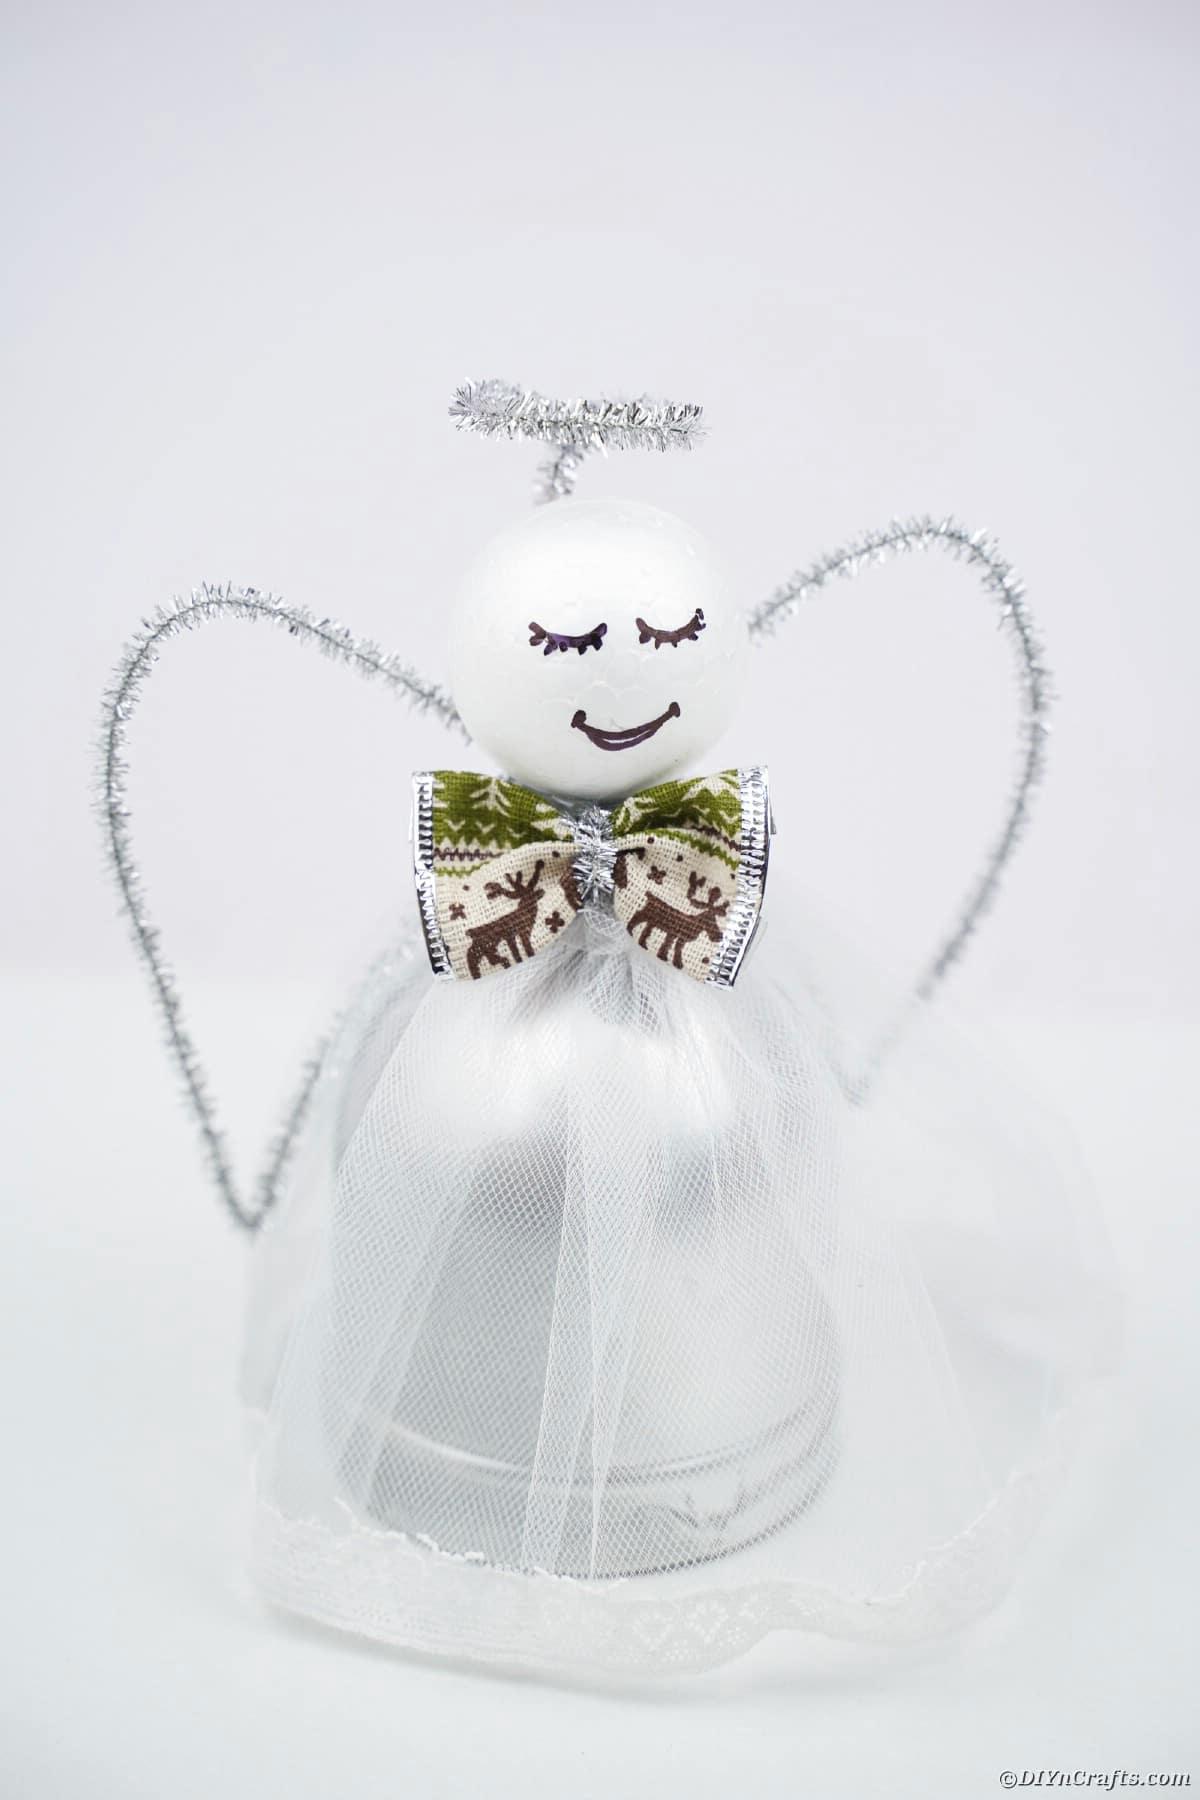 Angel on white background